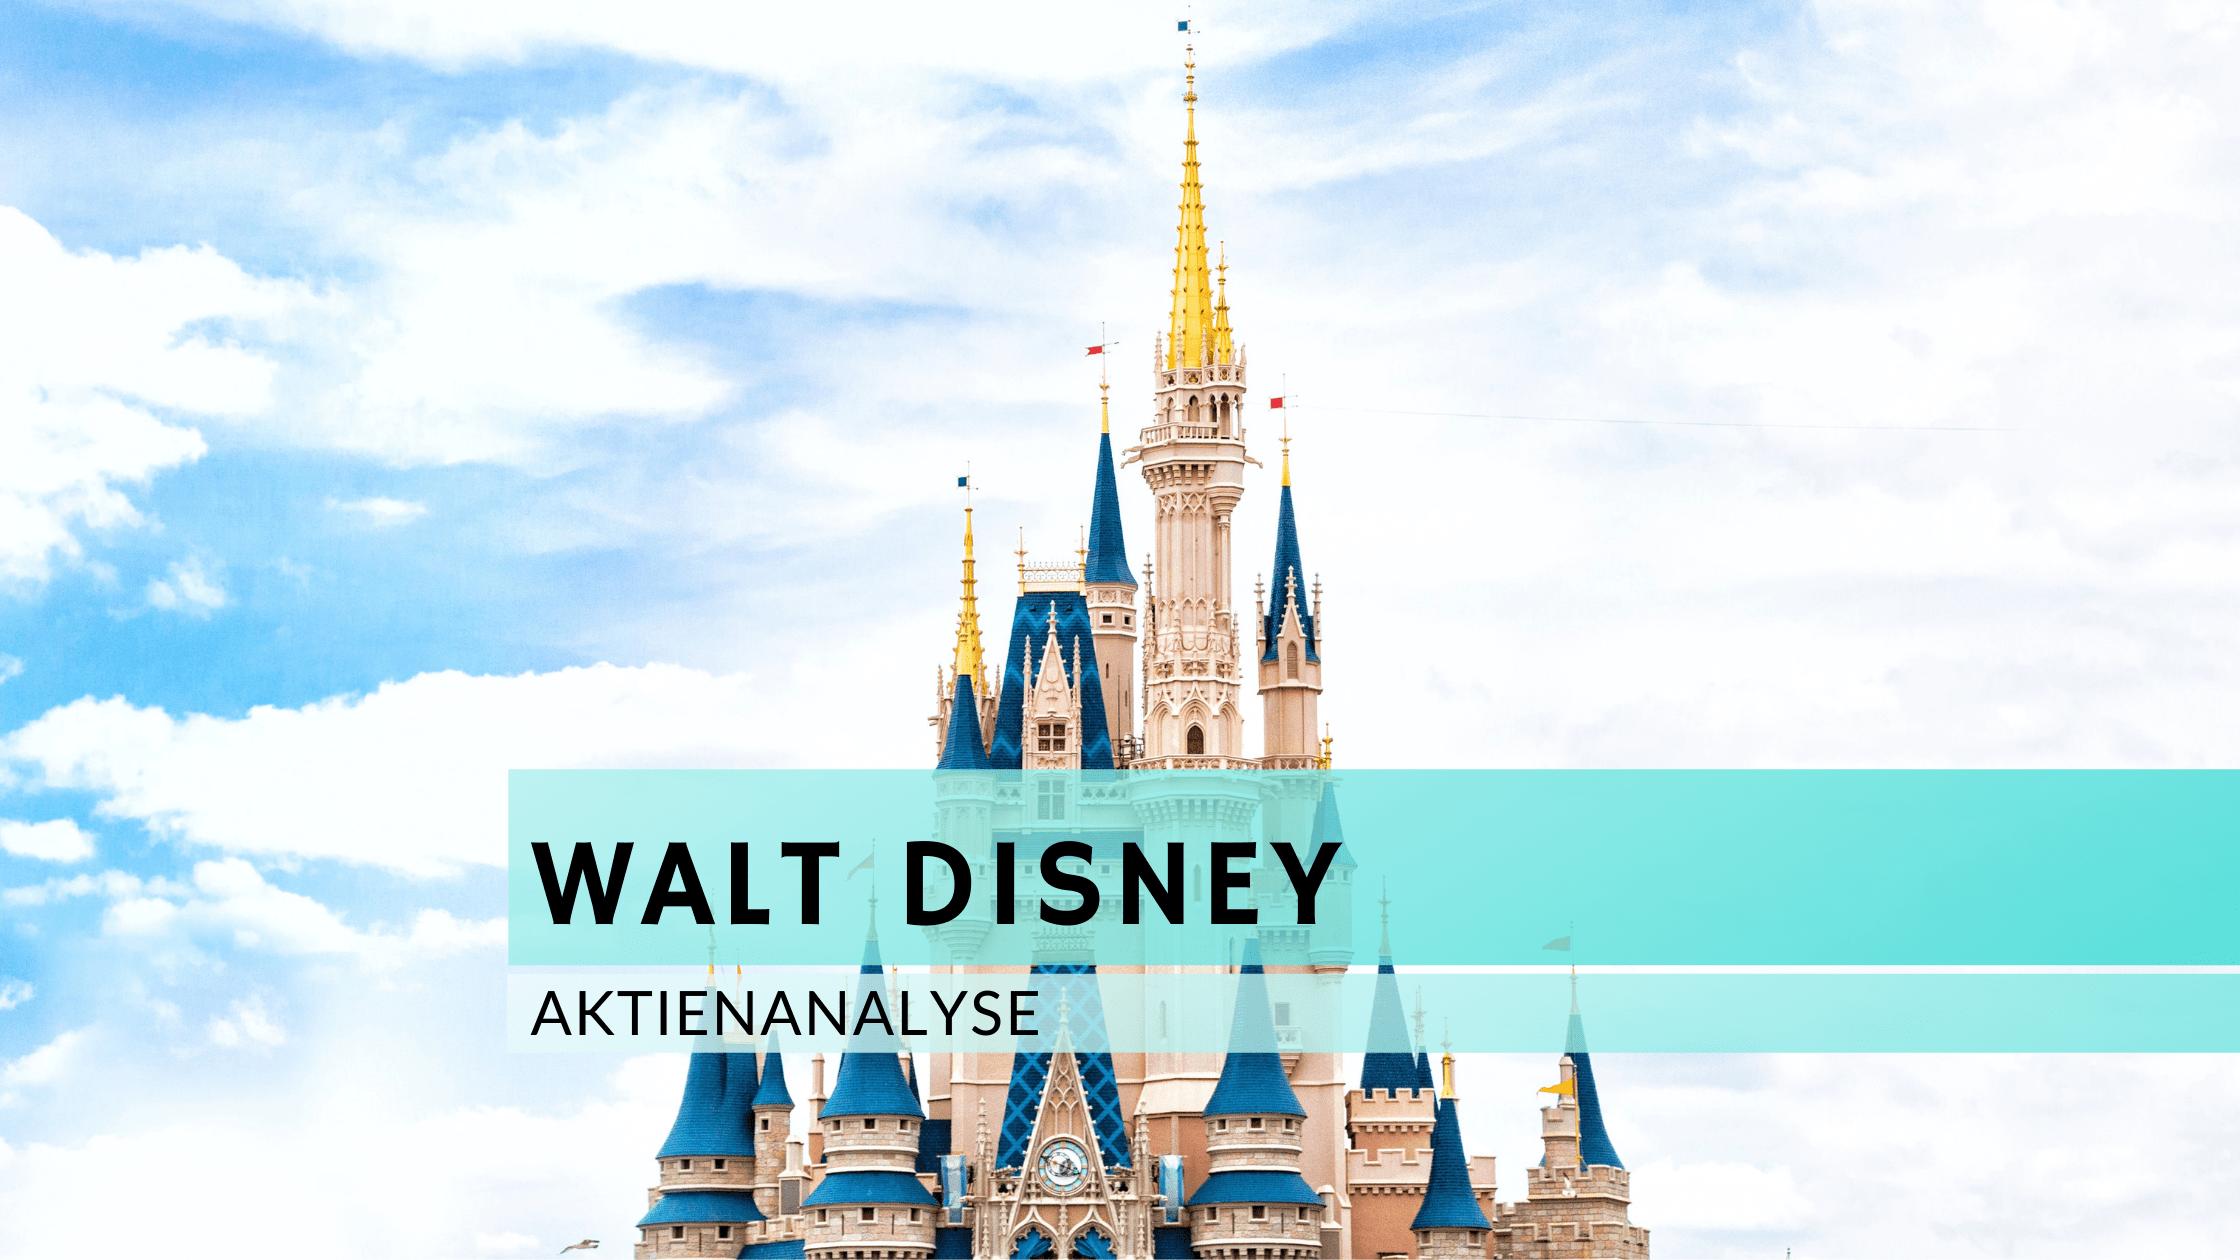 Walt Disney Aktienanalyse